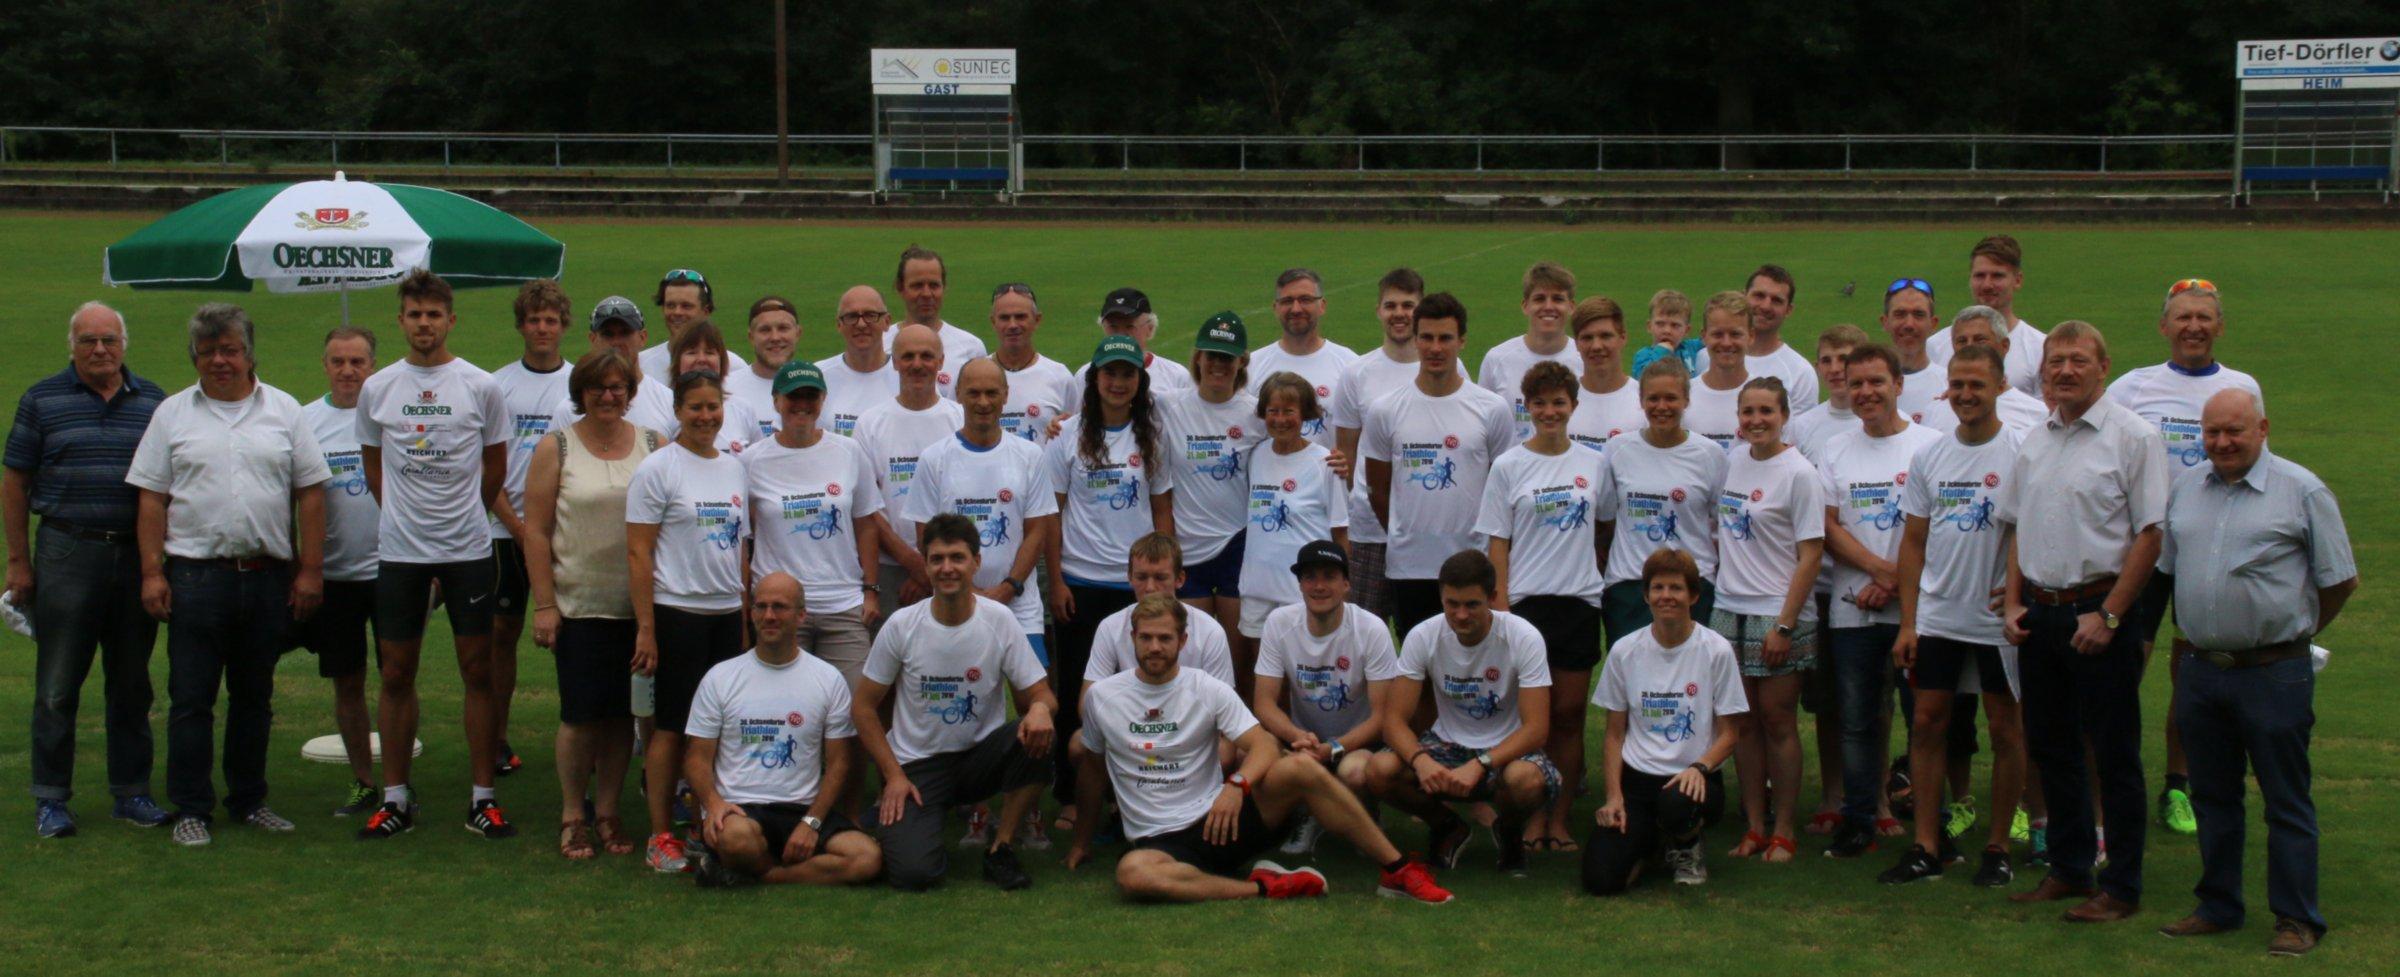 Ochsenfurter Vereinstriathlon 2016